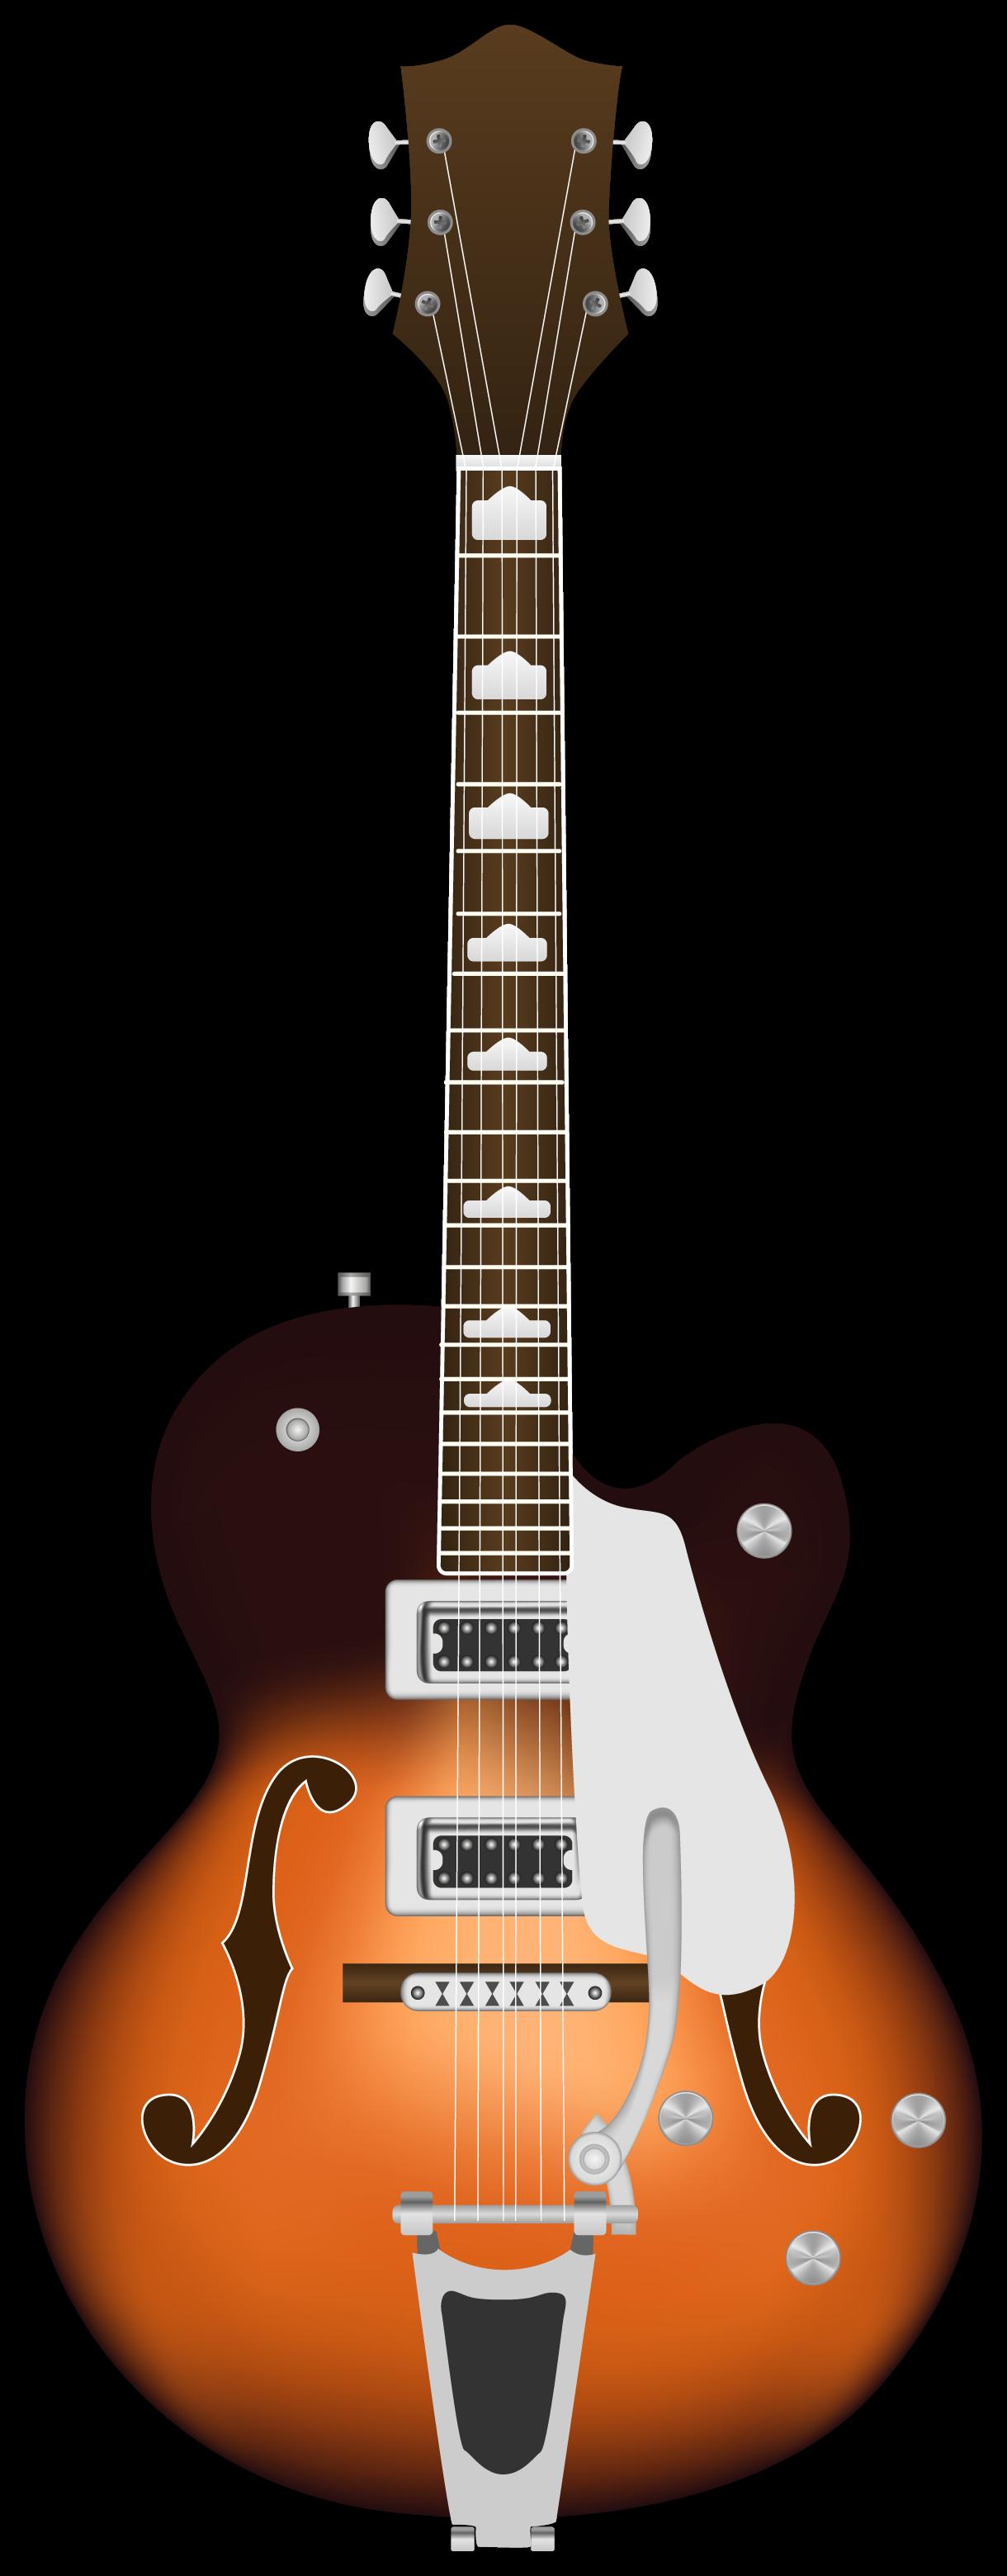 Clipart guitar 80 guitar. Png transparent free images